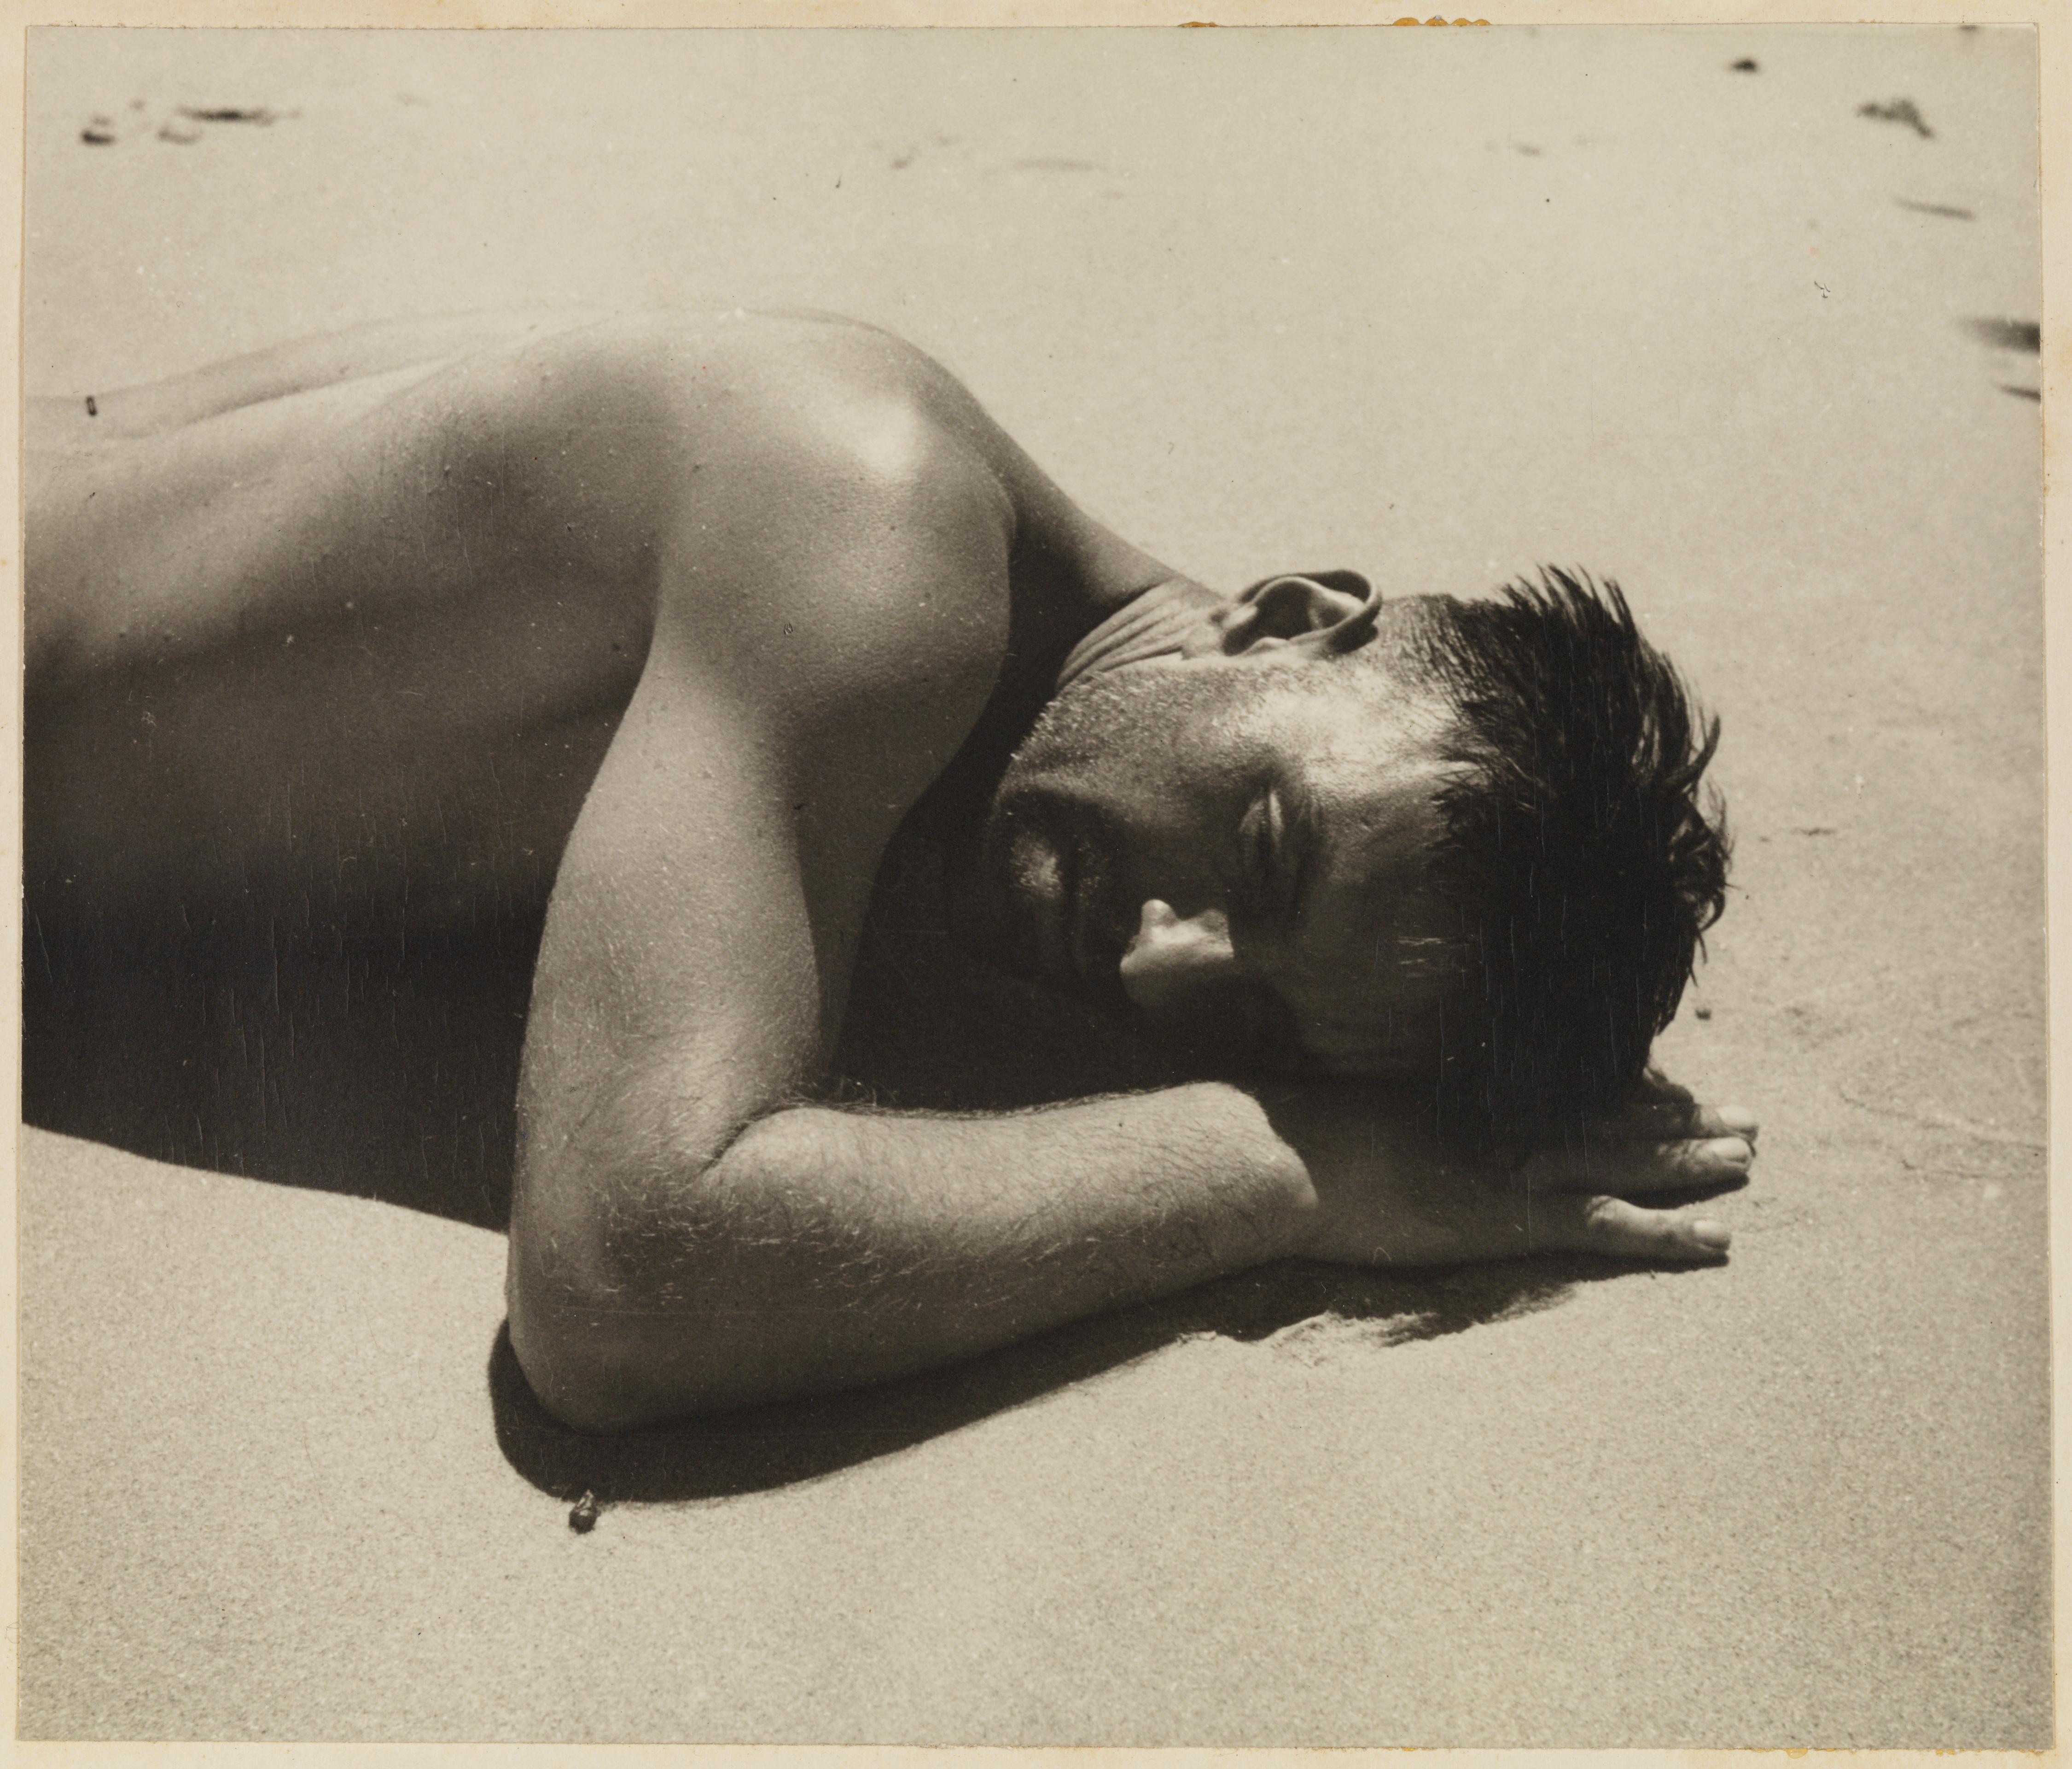 Harold Salvage sunbaking, variant to